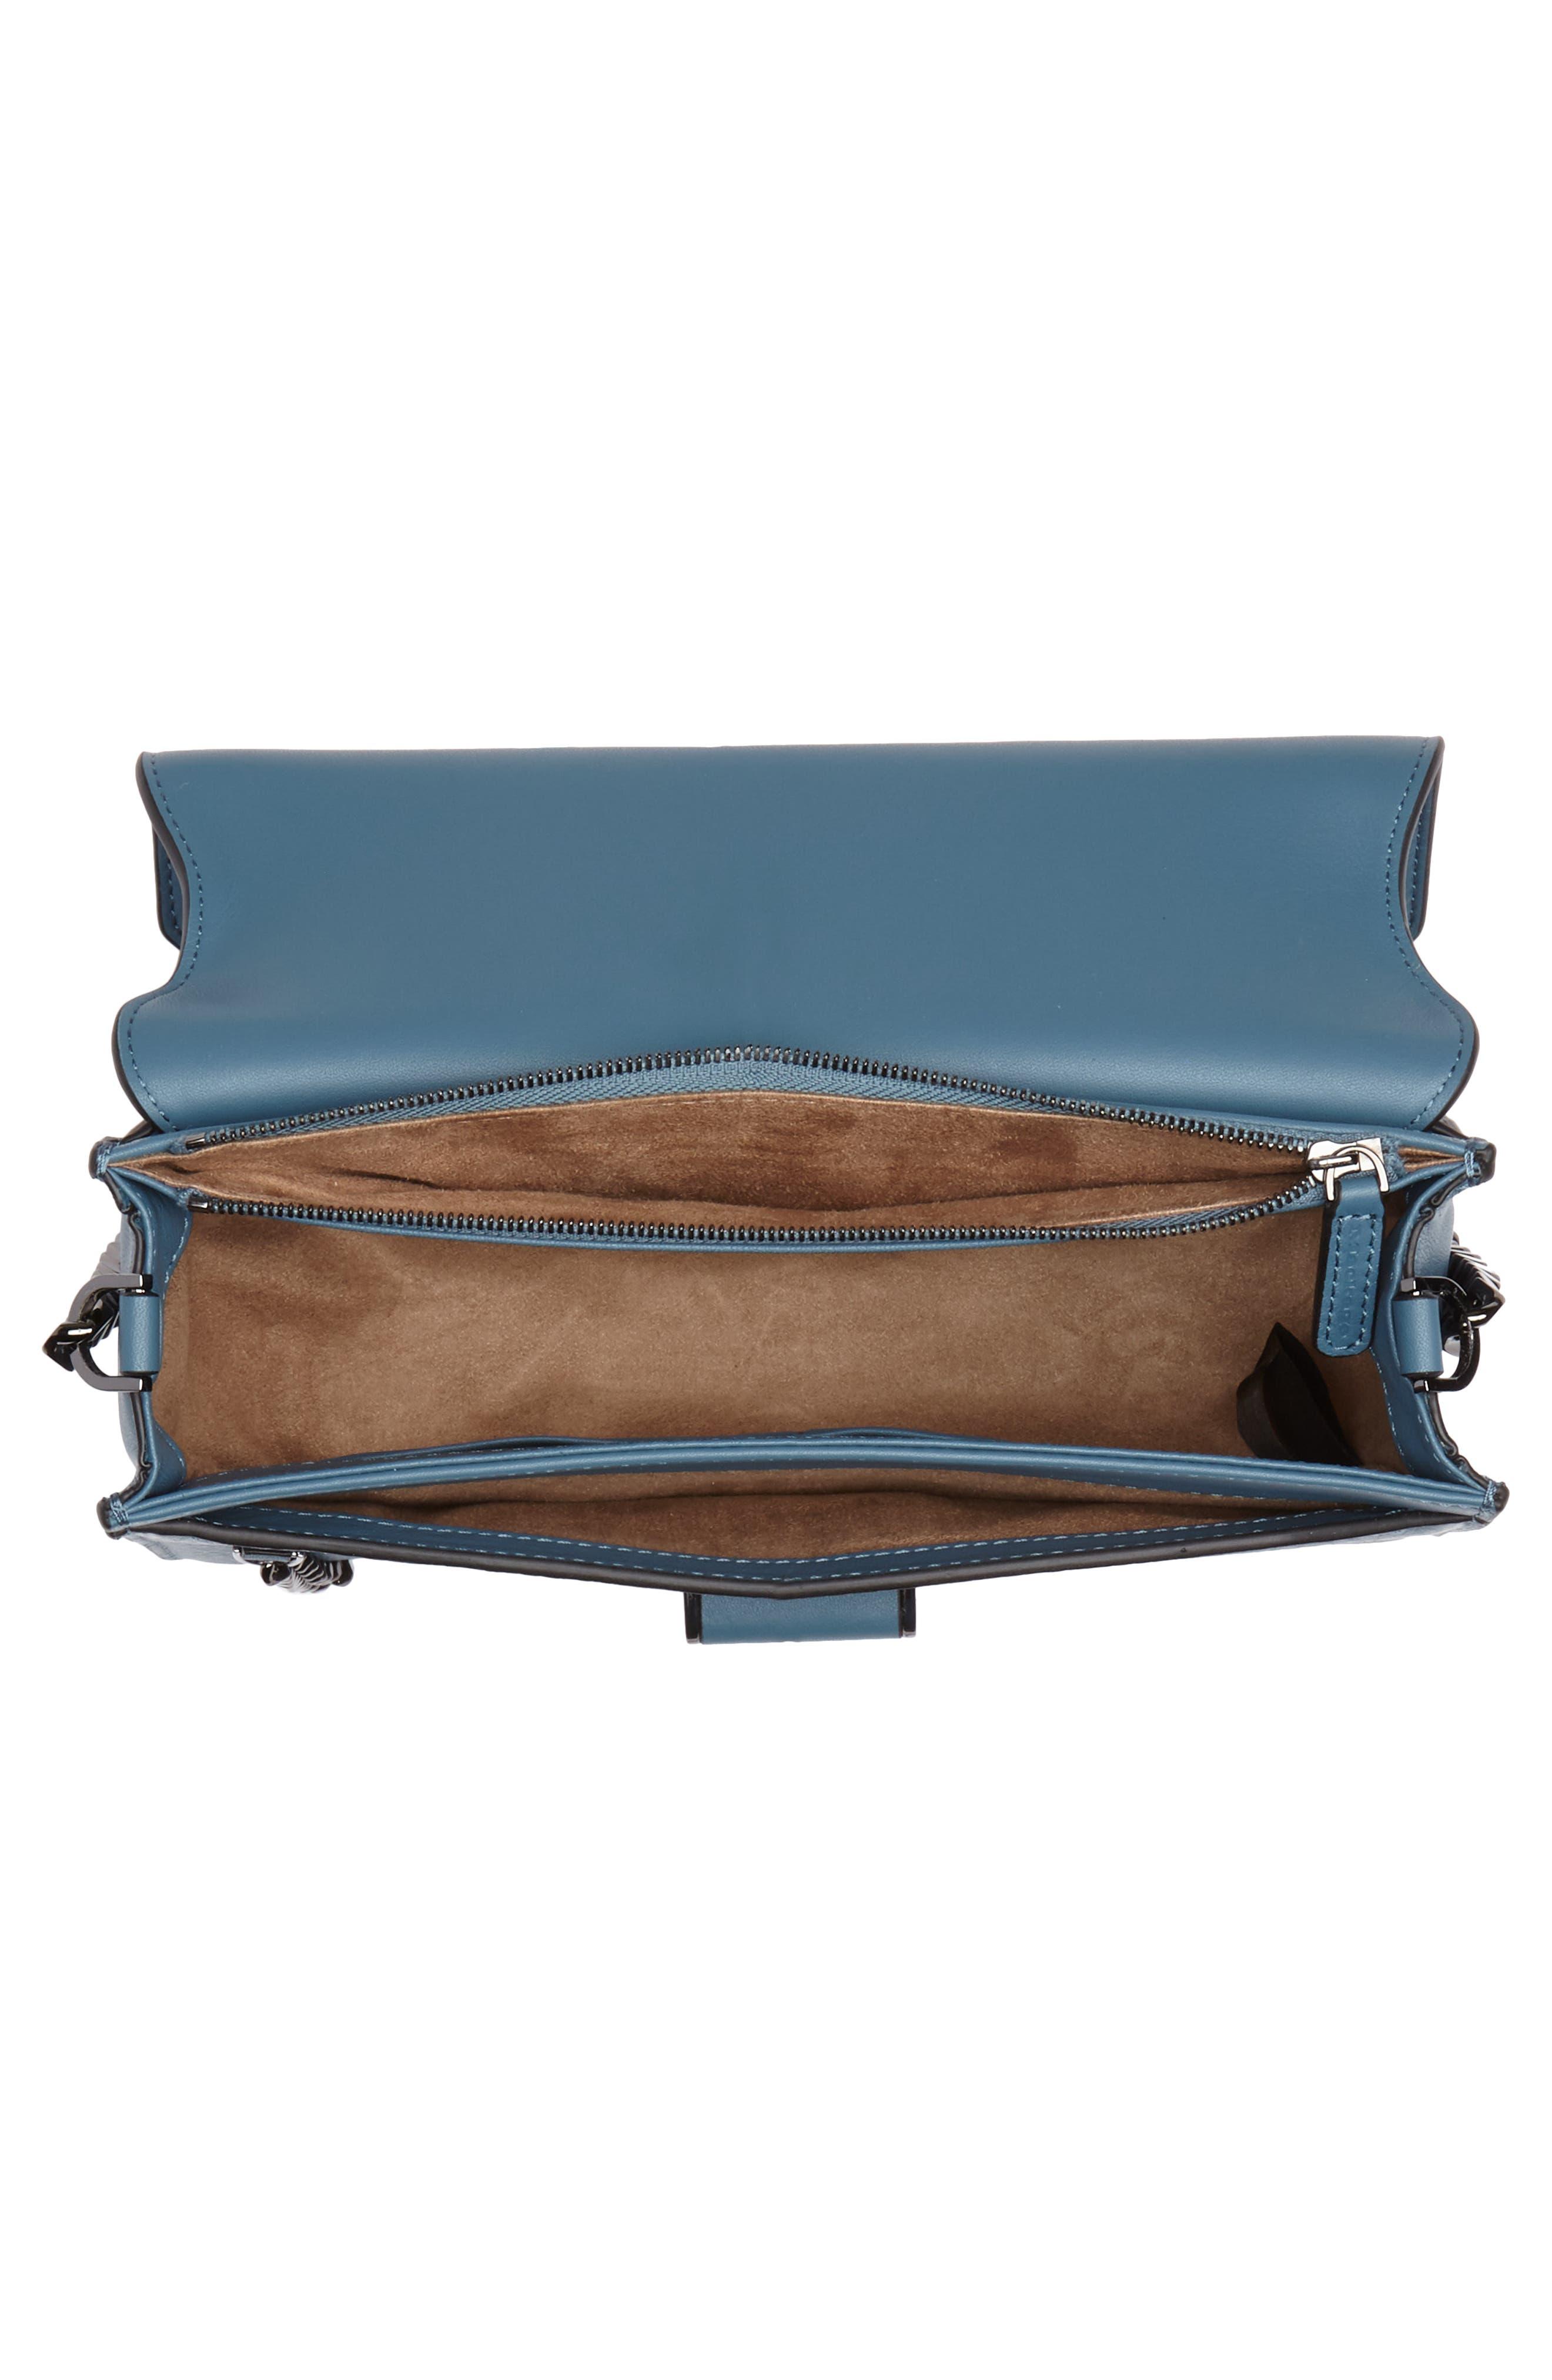 Cortney Nappa Leather Shoulder/Crossbody Bag,                             Alternate thumbnail 15, color,